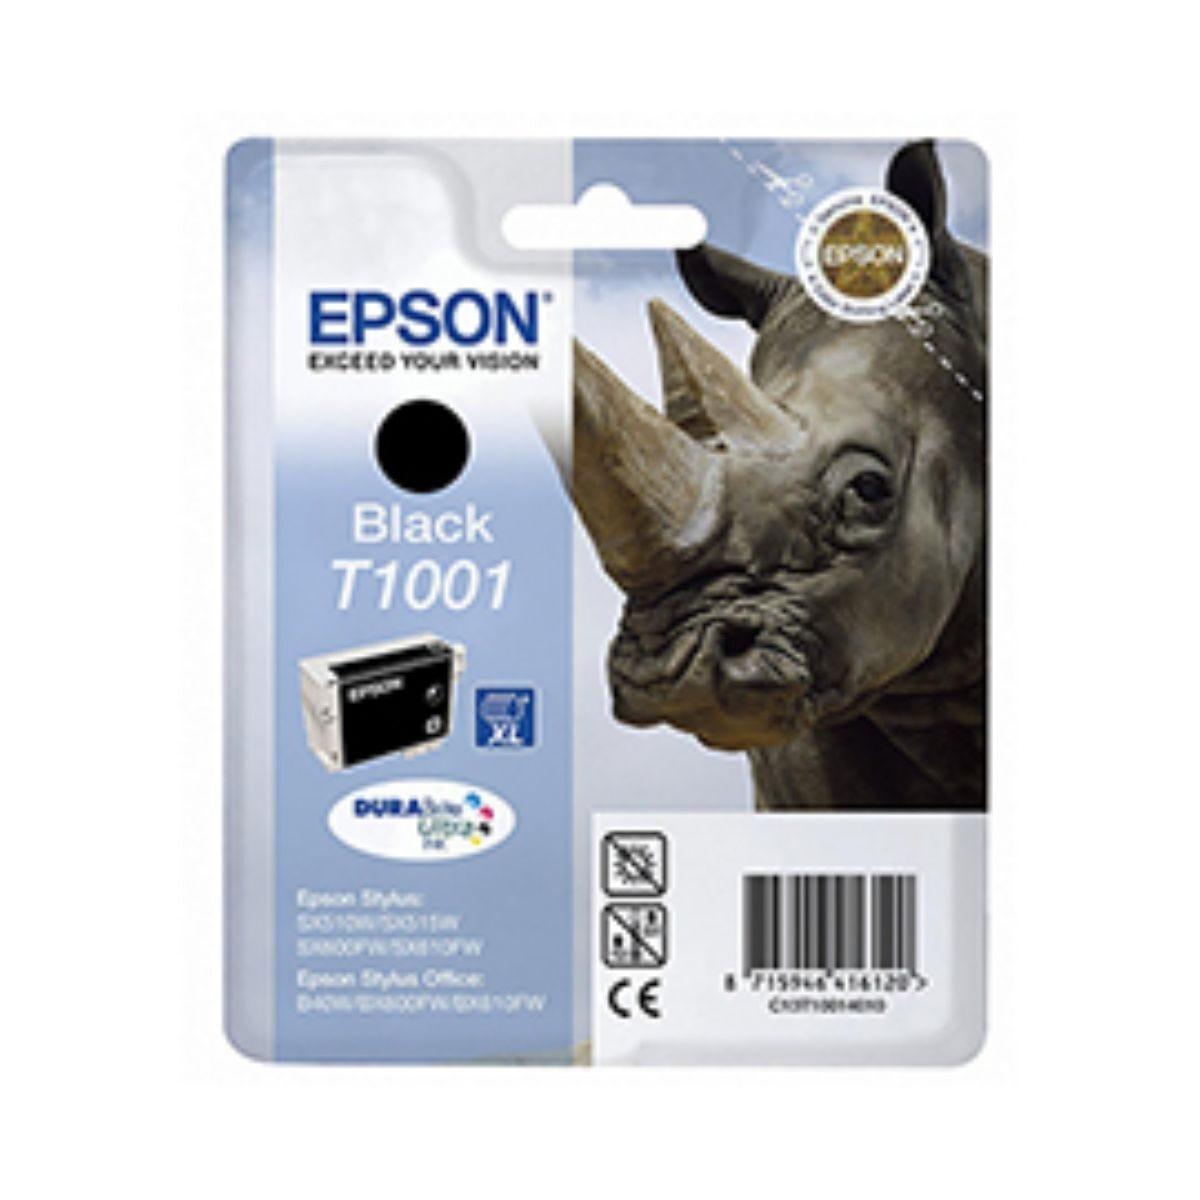 Epson T1001 XL Ink Cartridge Black